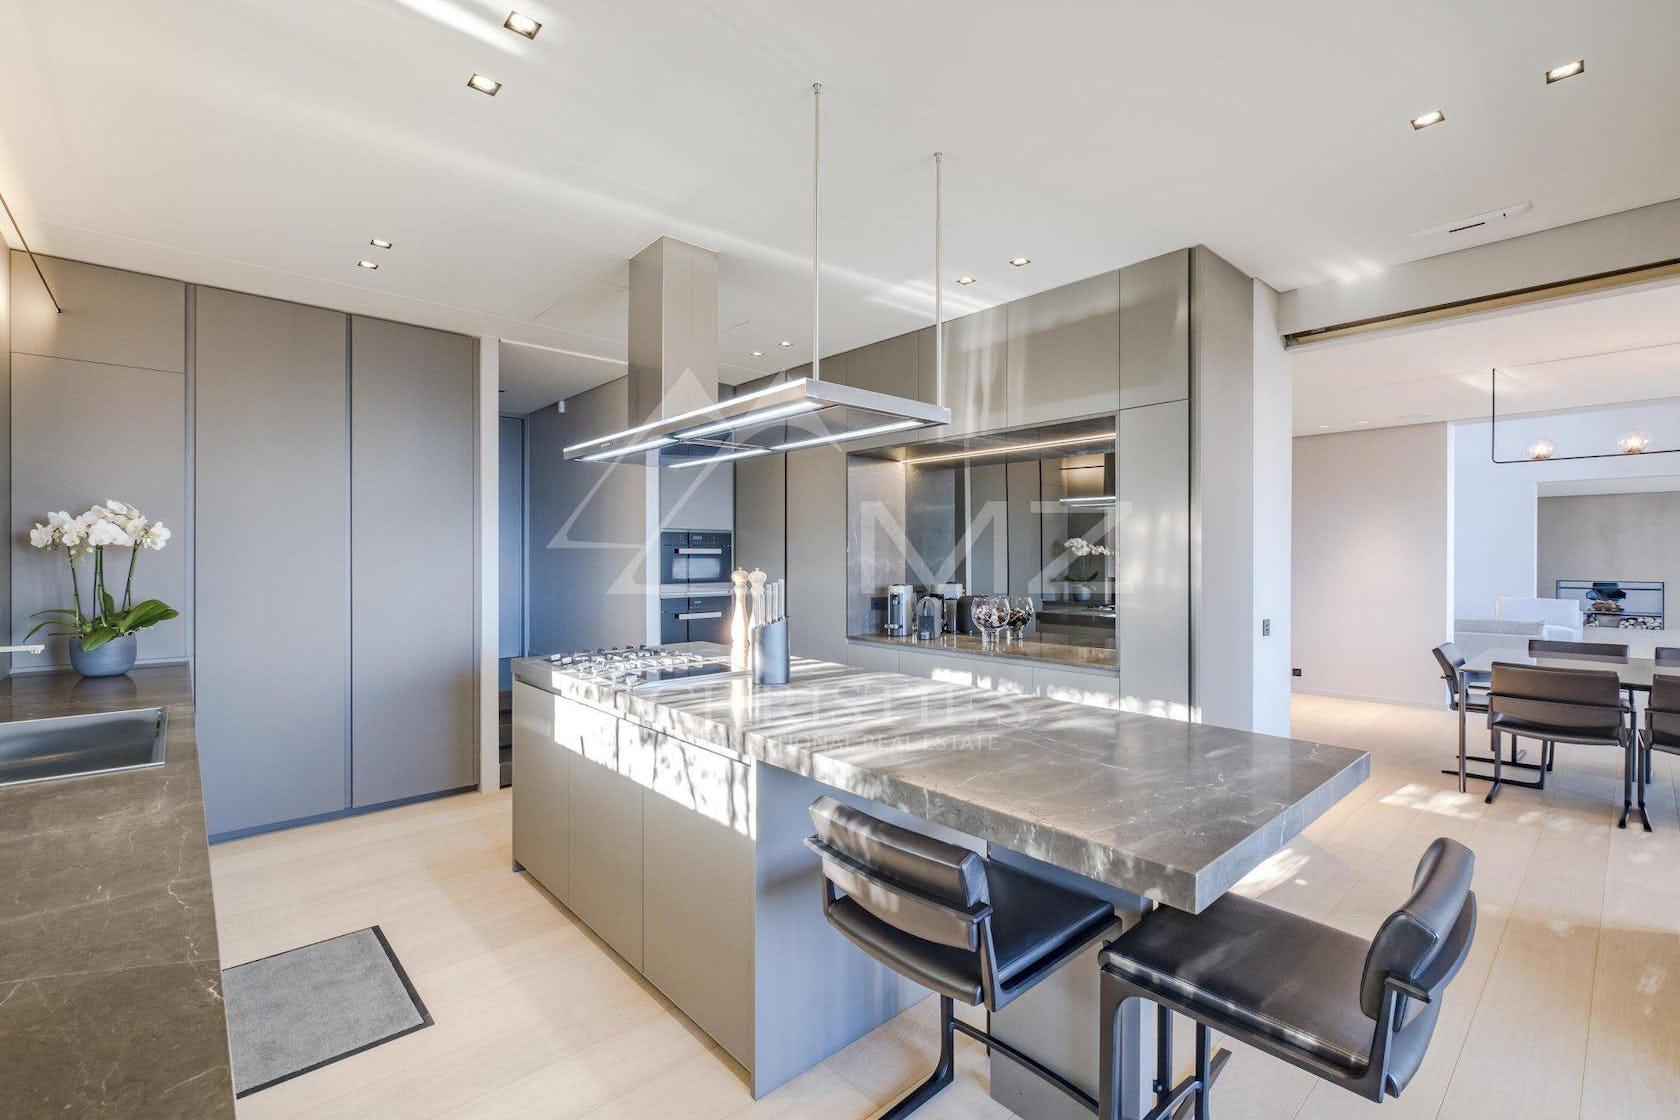 kitchen island indoors interior design flooring